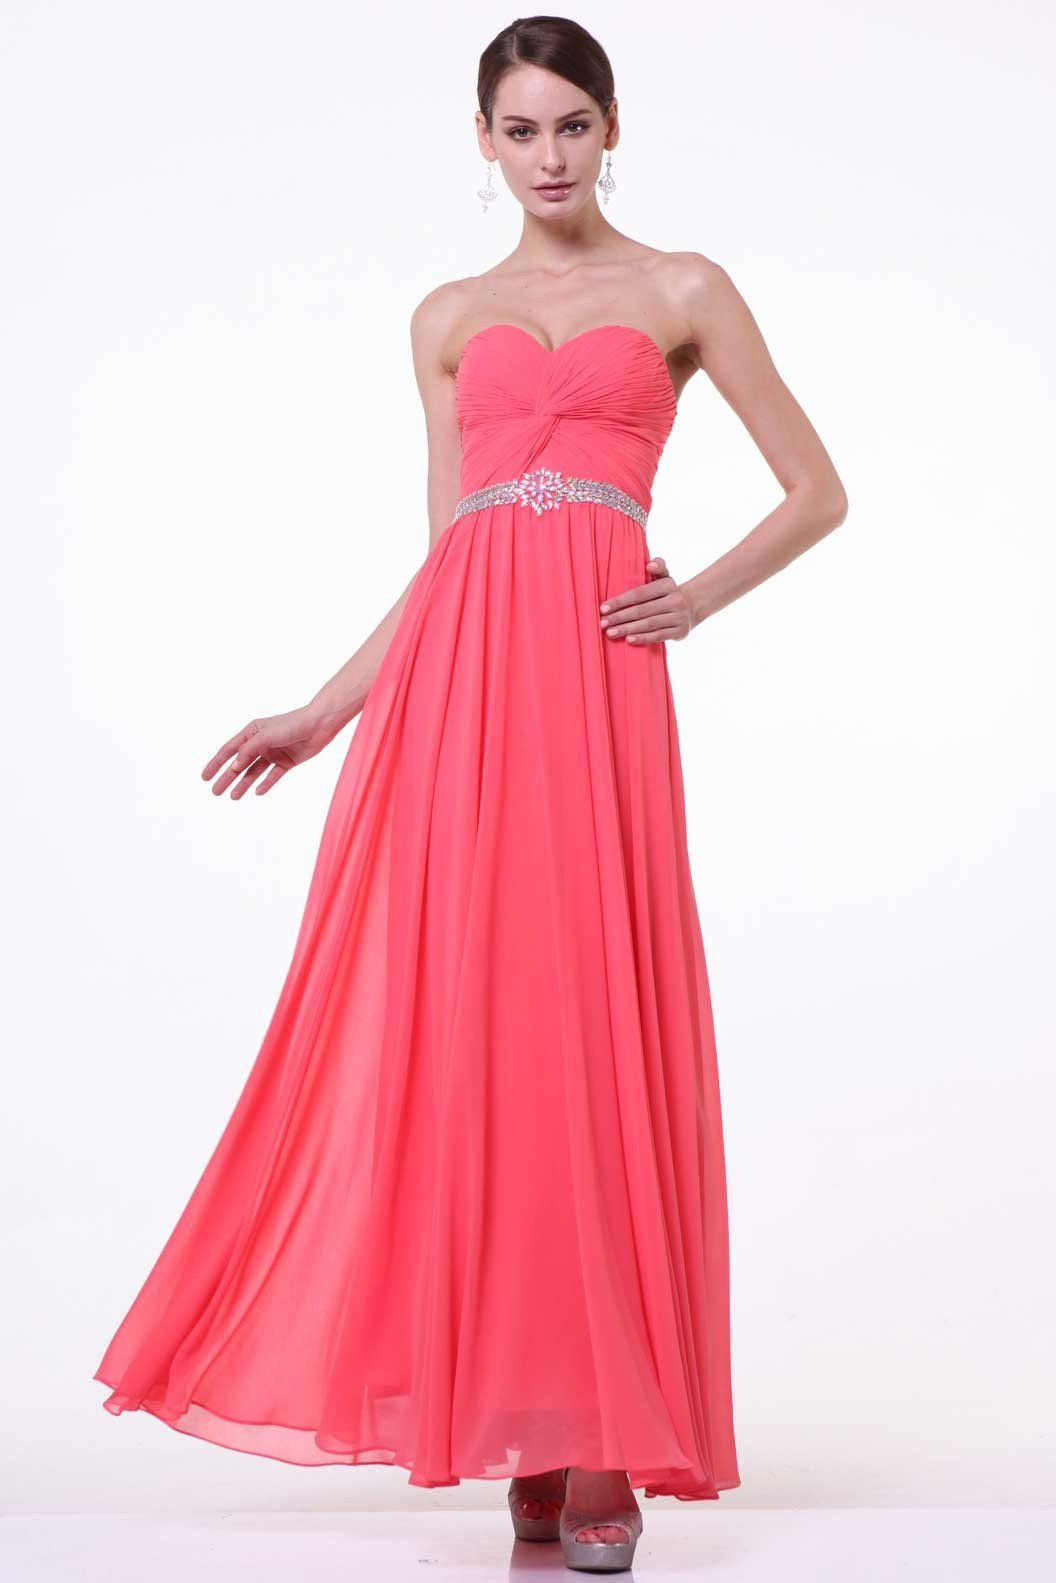 Bridesmaid strapless dress cdcj products pinterest strapless